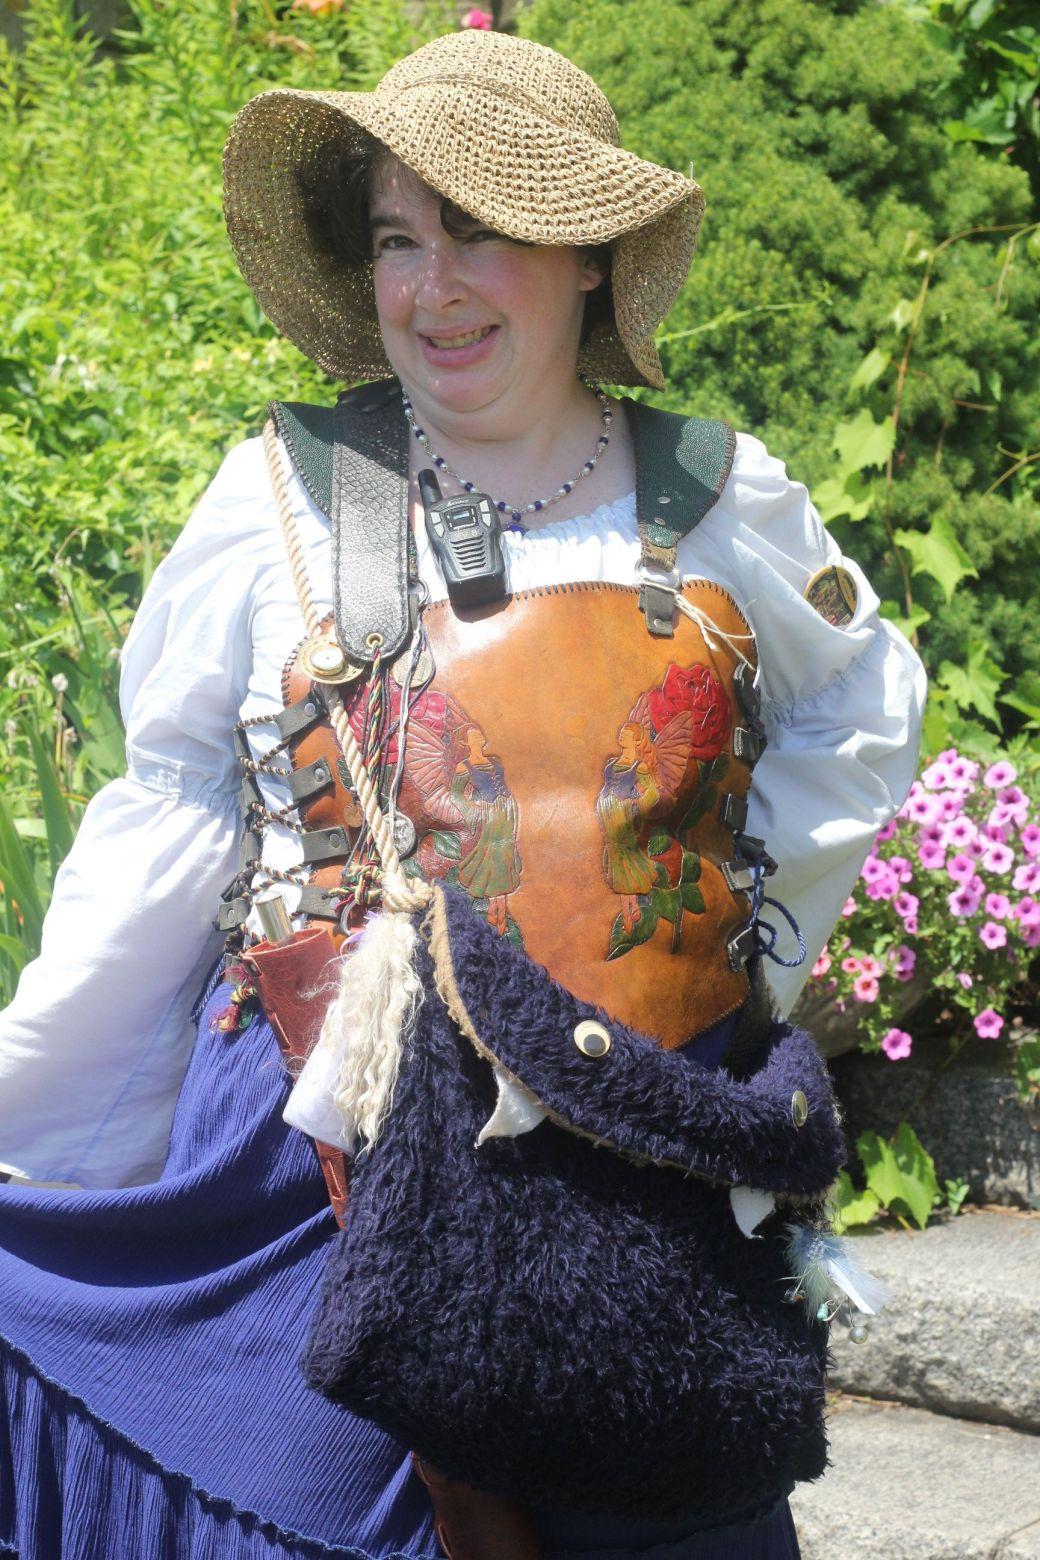 gloucester hammond castle renaissance fair woman with leather outfit